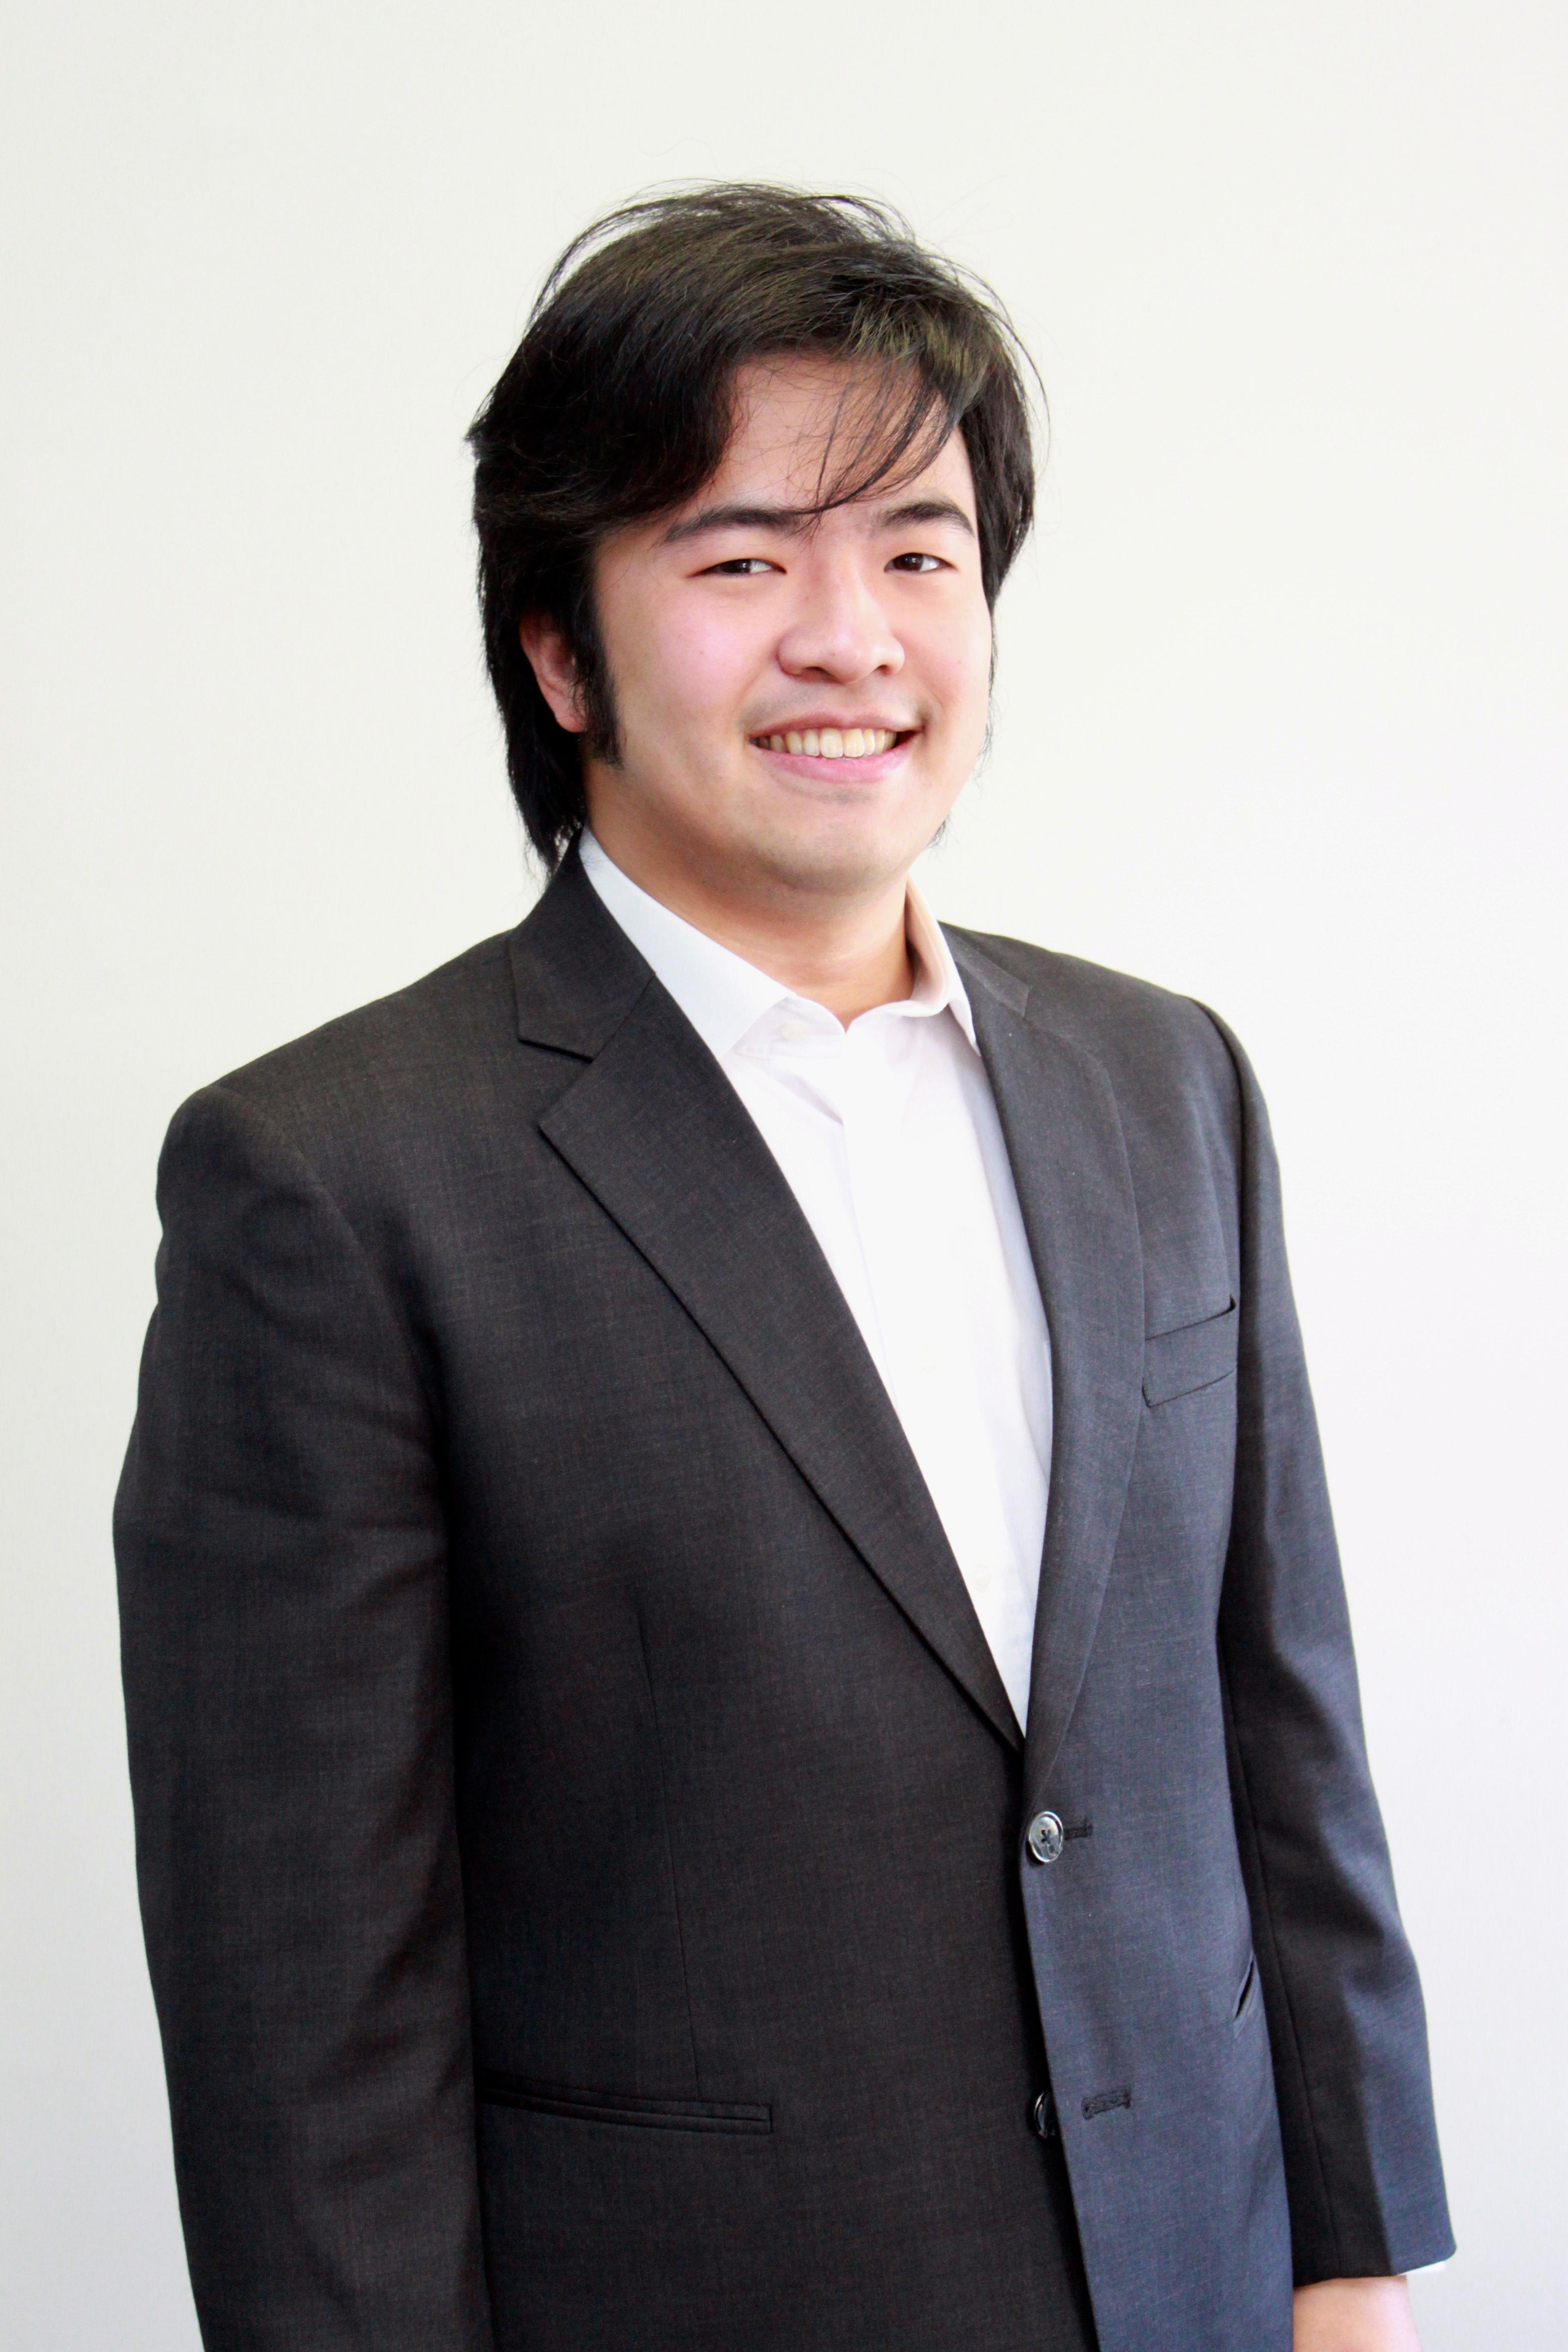 Bryan Ho